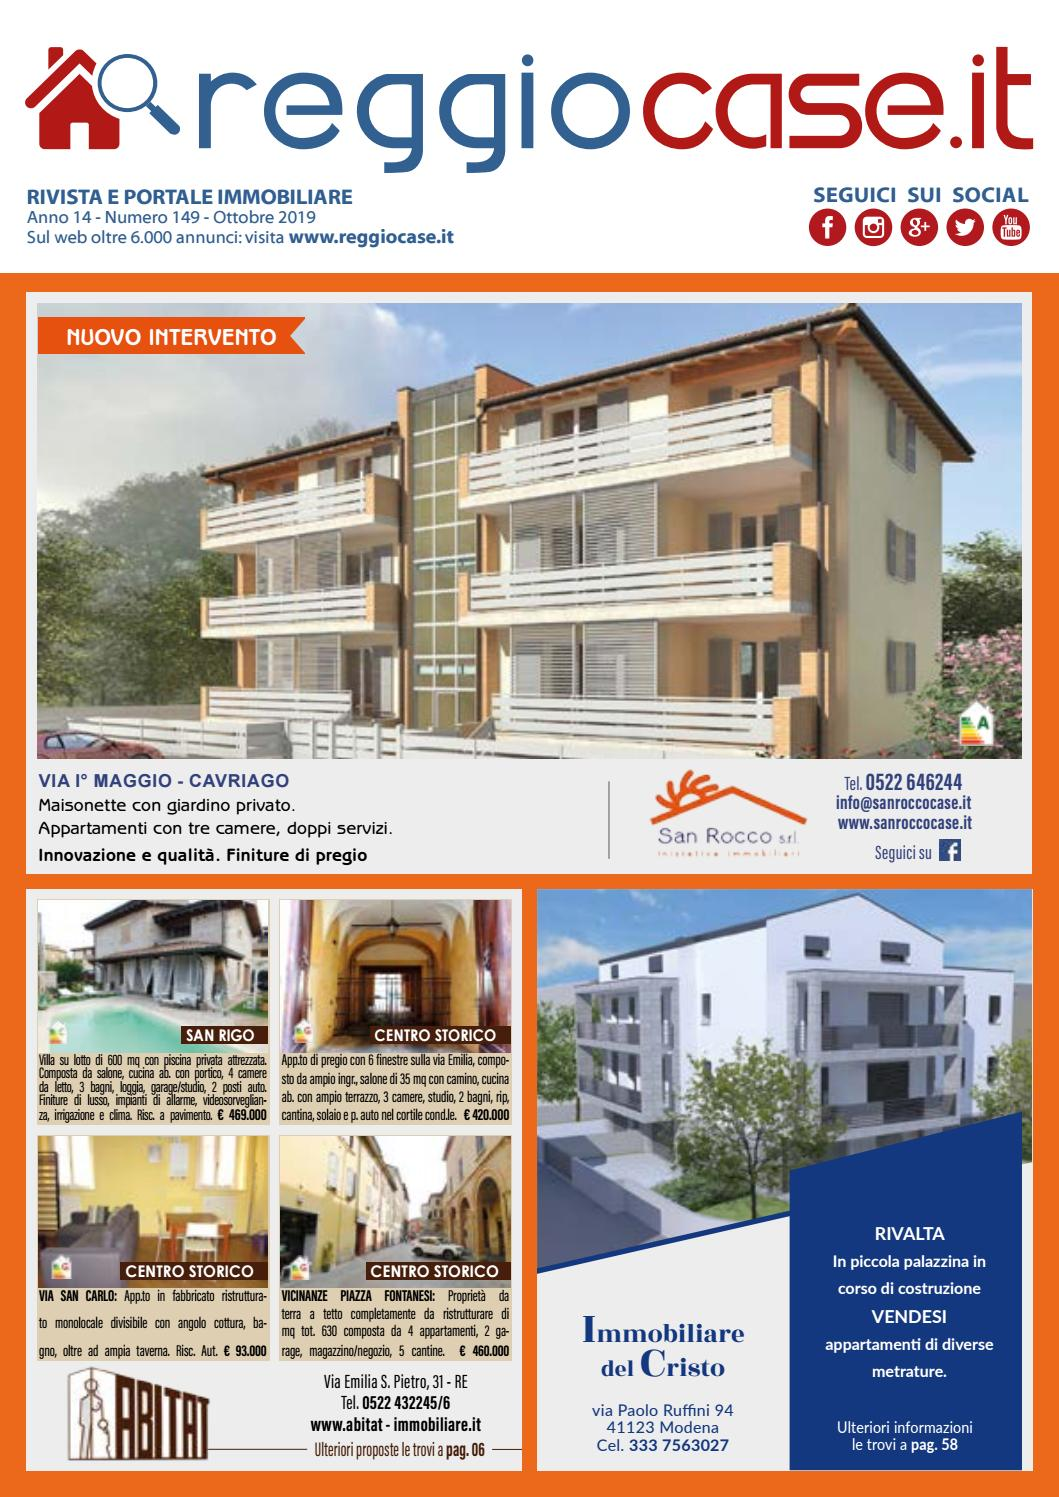 Ristrutturare Appartamento 35 Mq reggiocase.it ottobre 2019 by naytes mycase - issuu